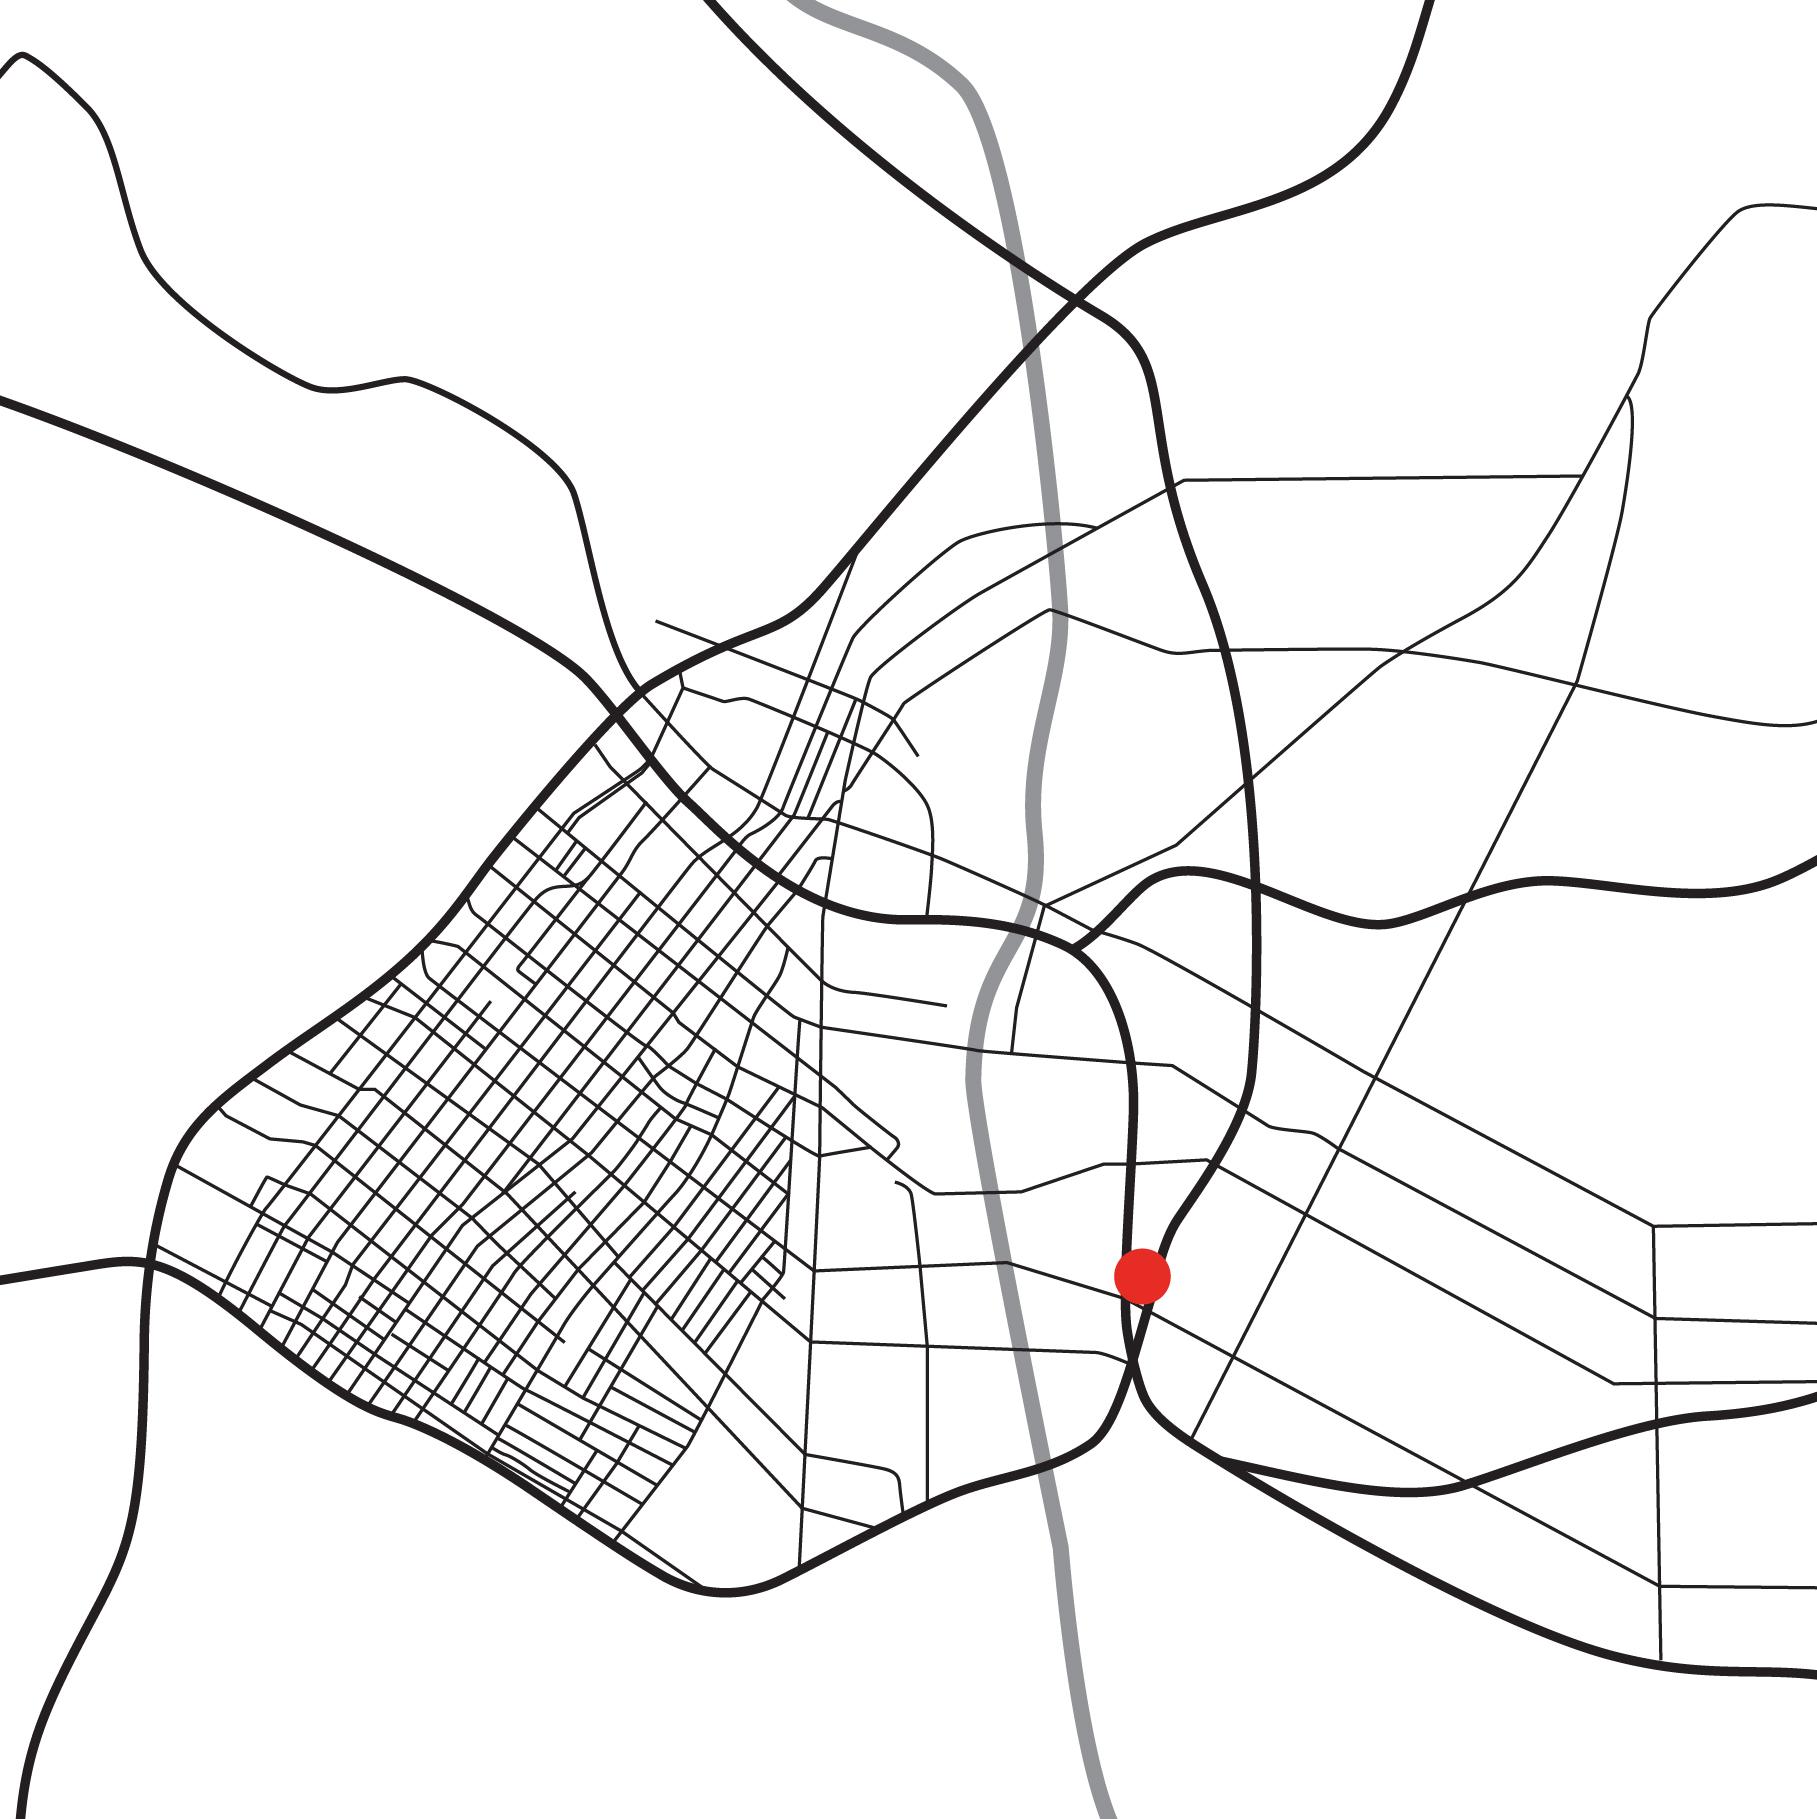 DTLA_MAP_003_VIEWPOINT_Boyle Heigts-01.jpg